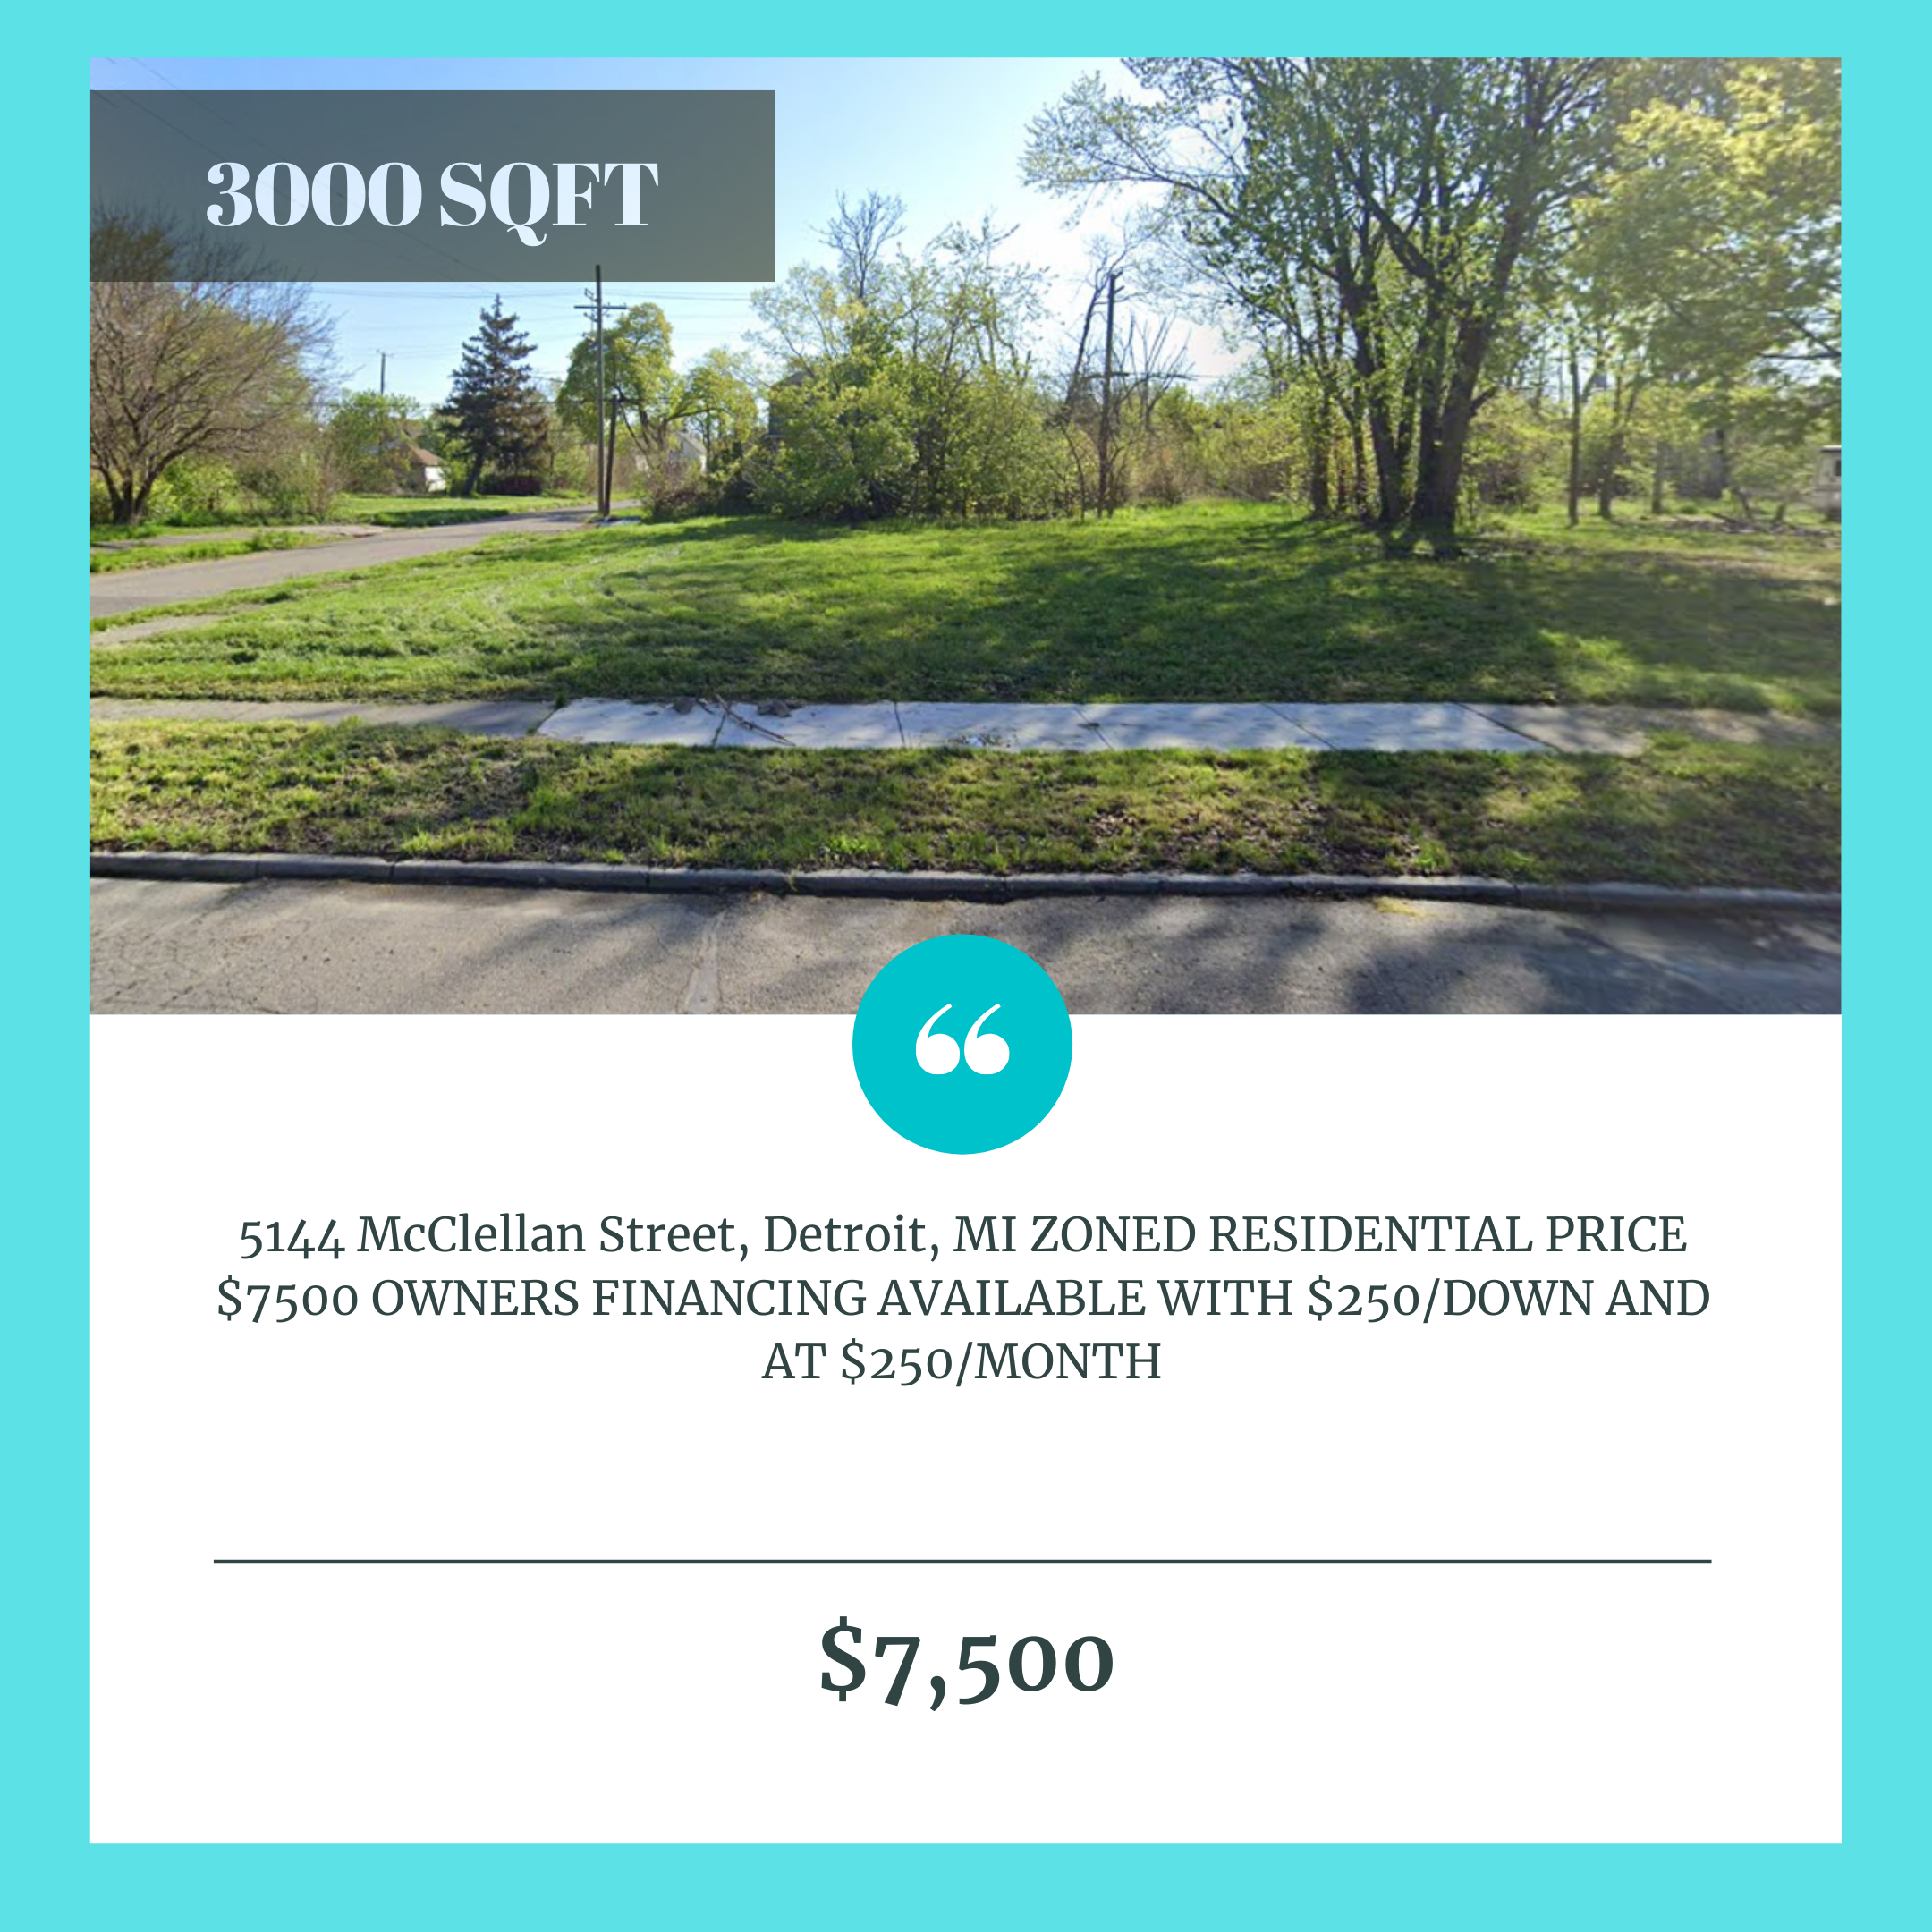 5144 McClellan Street, Detroit, MI